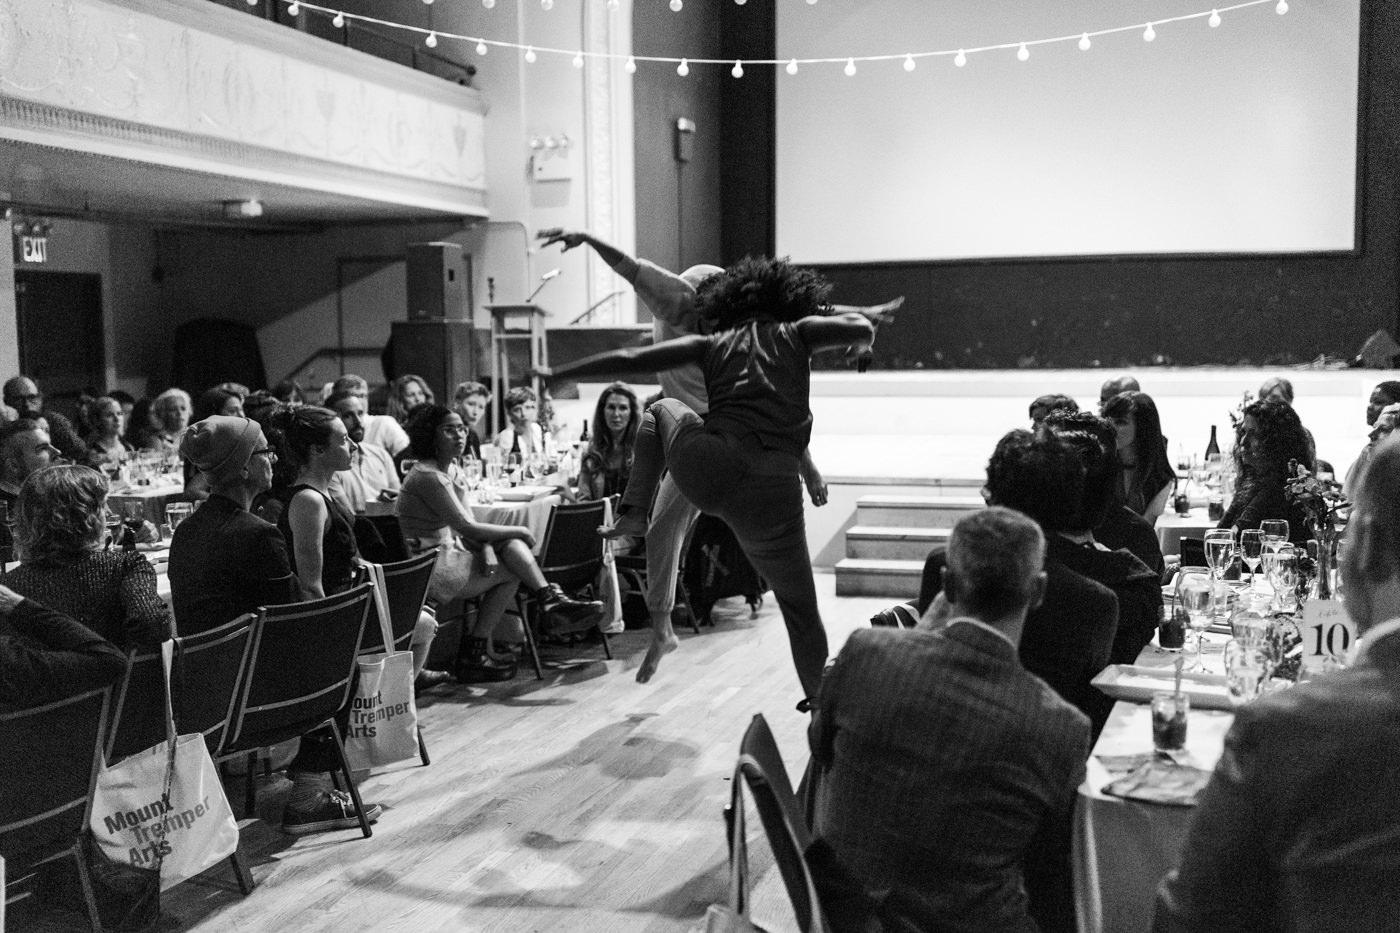 Mt Tremper Arts Gala -  NYC event photographer Kamp Weddings-11.jpg